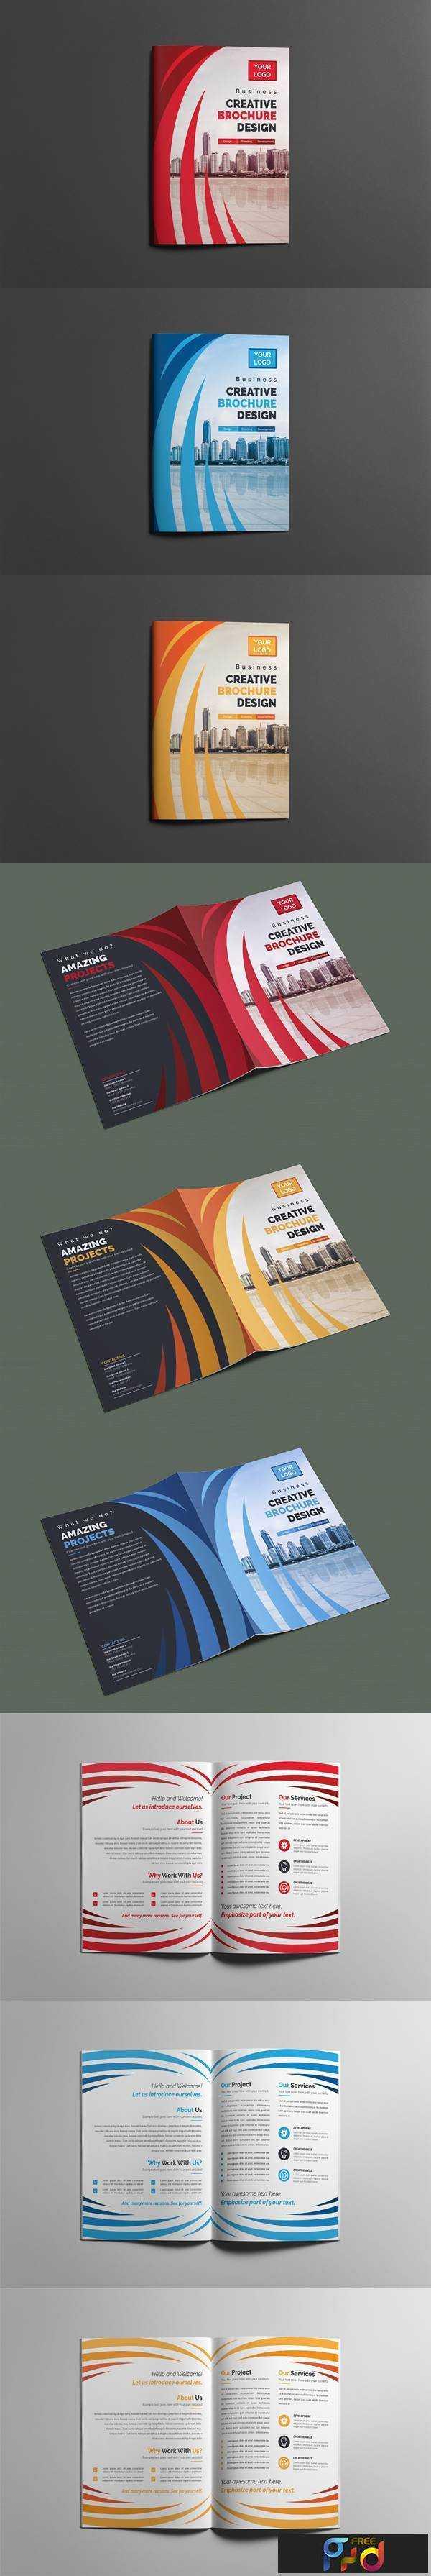 1806114 Bifold Brochure 2430270 1